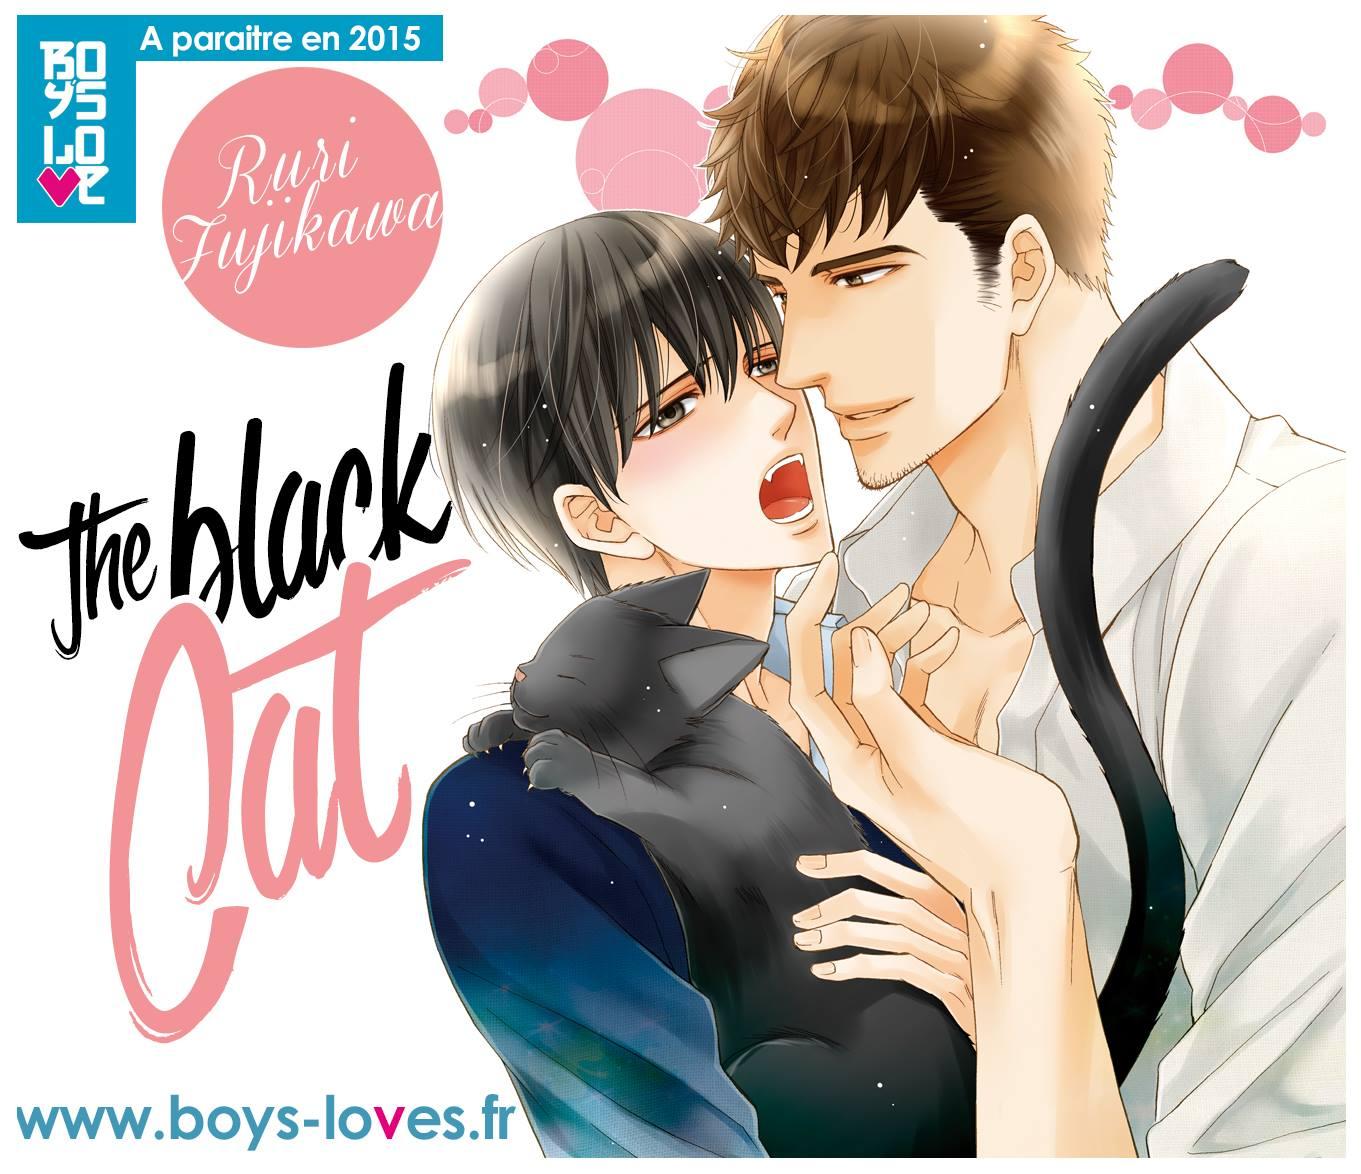 http://www.manga-news.com/public/2014/news_fr_12/the-black-cat-idp-annonce.jpg